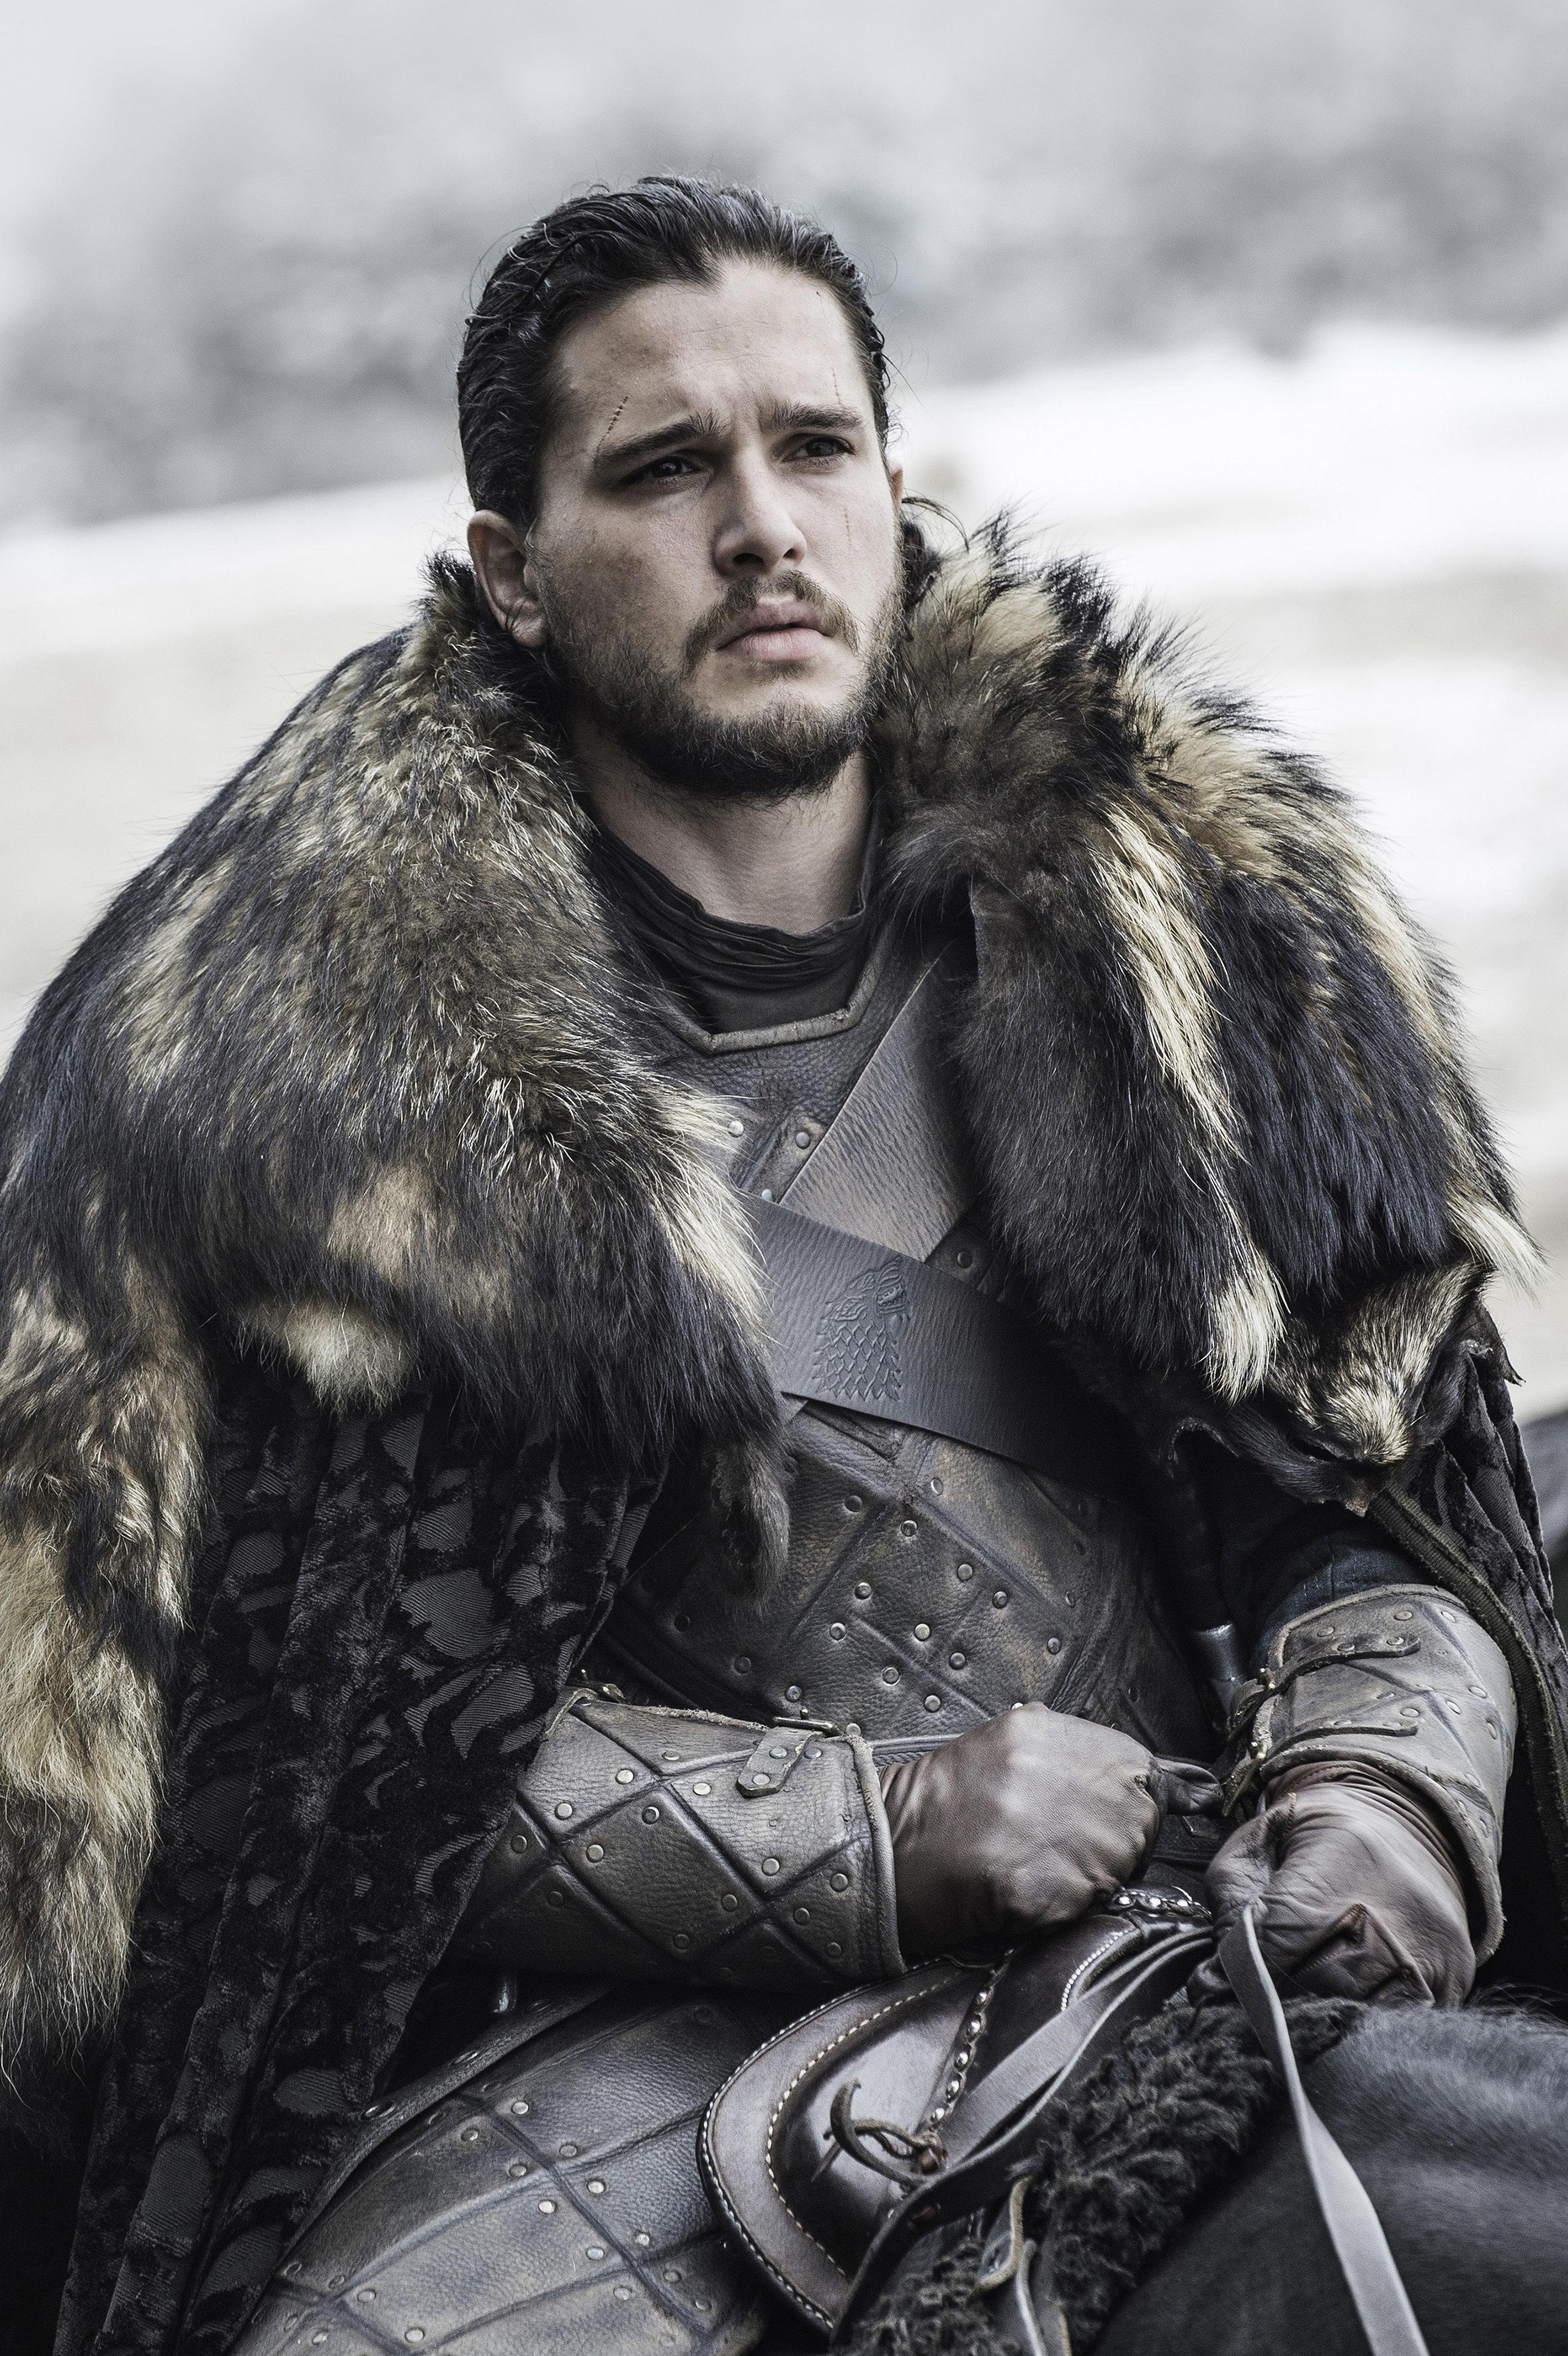 Kit Harington, The King In The North, Calls Trump A 'Con